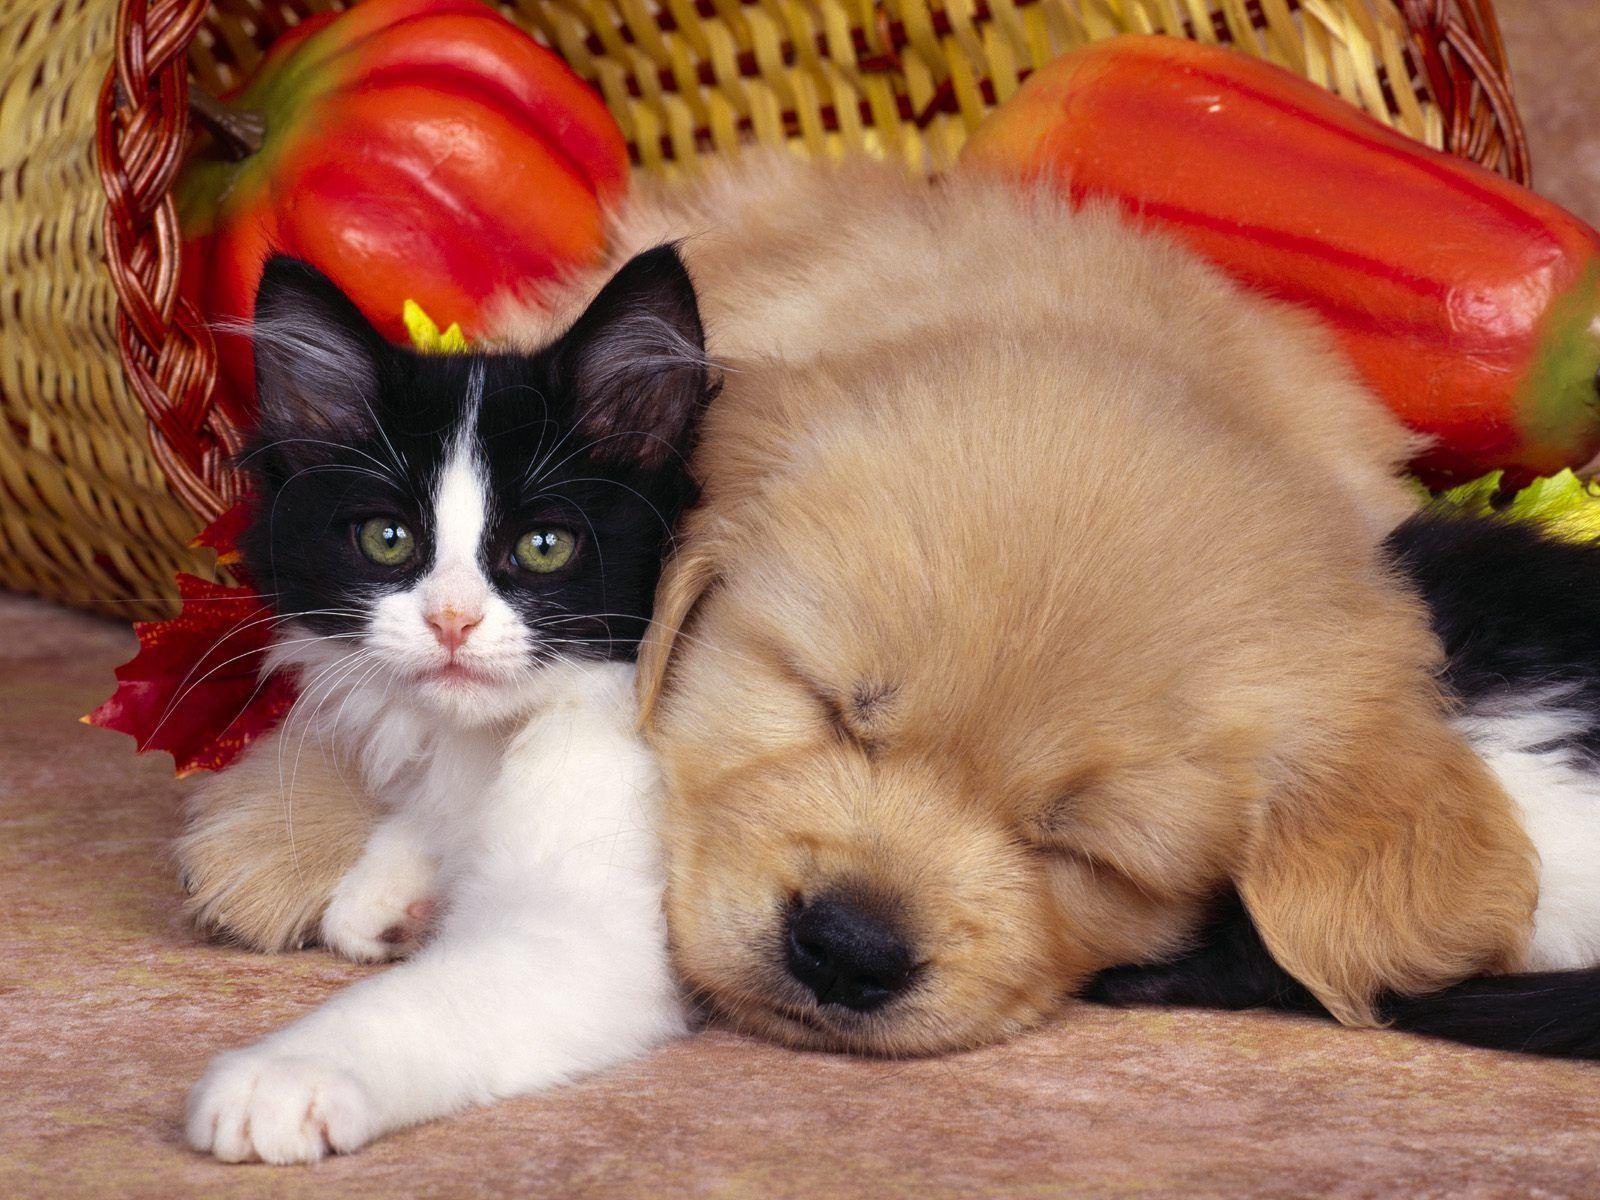 Cute Cat And Dog Hdpicorner